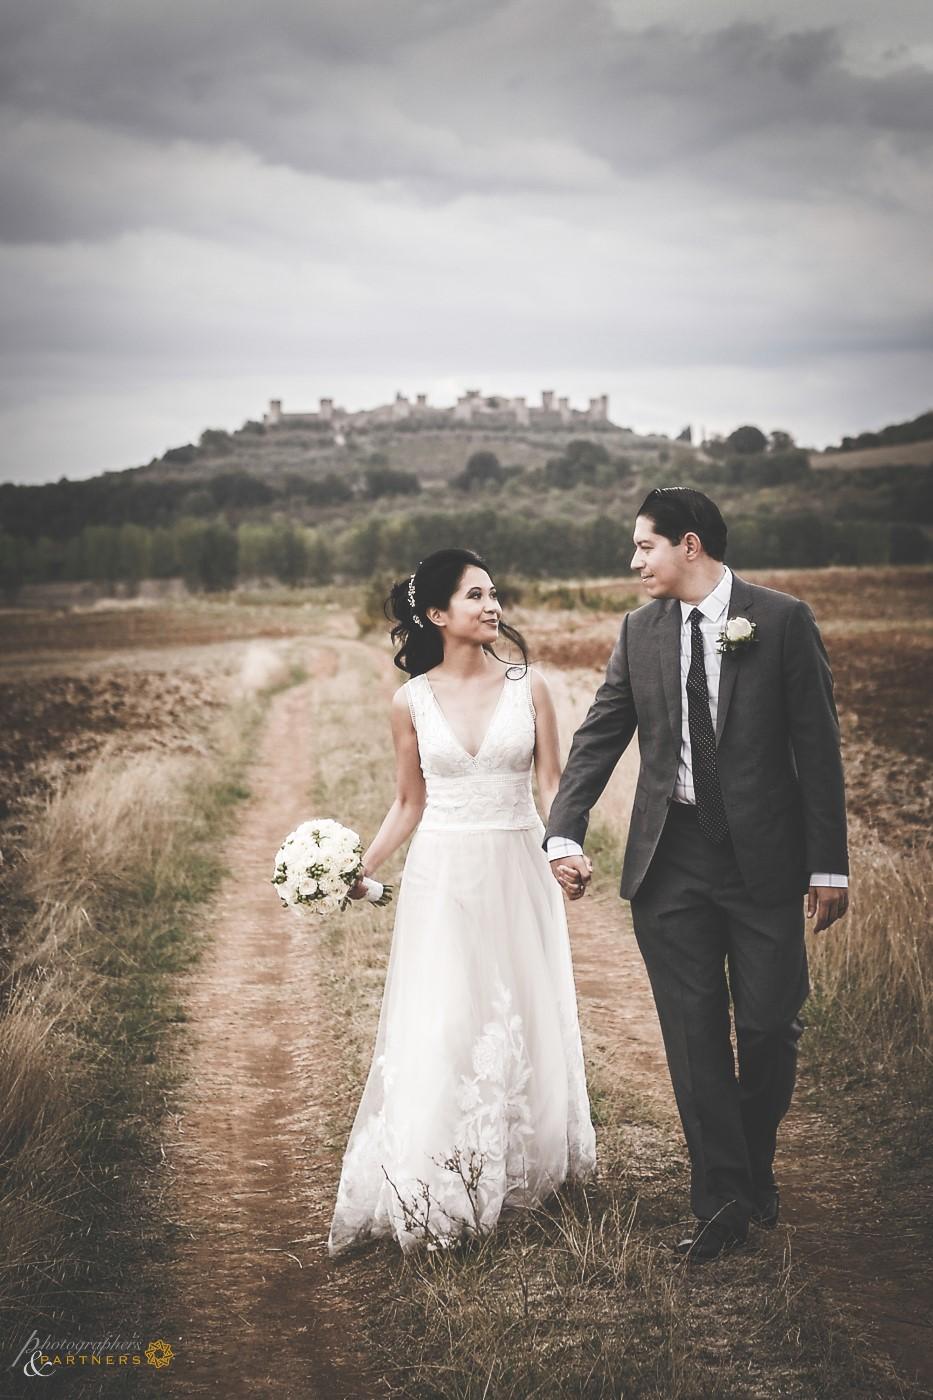 photographers_weddings_siena_23.jpg